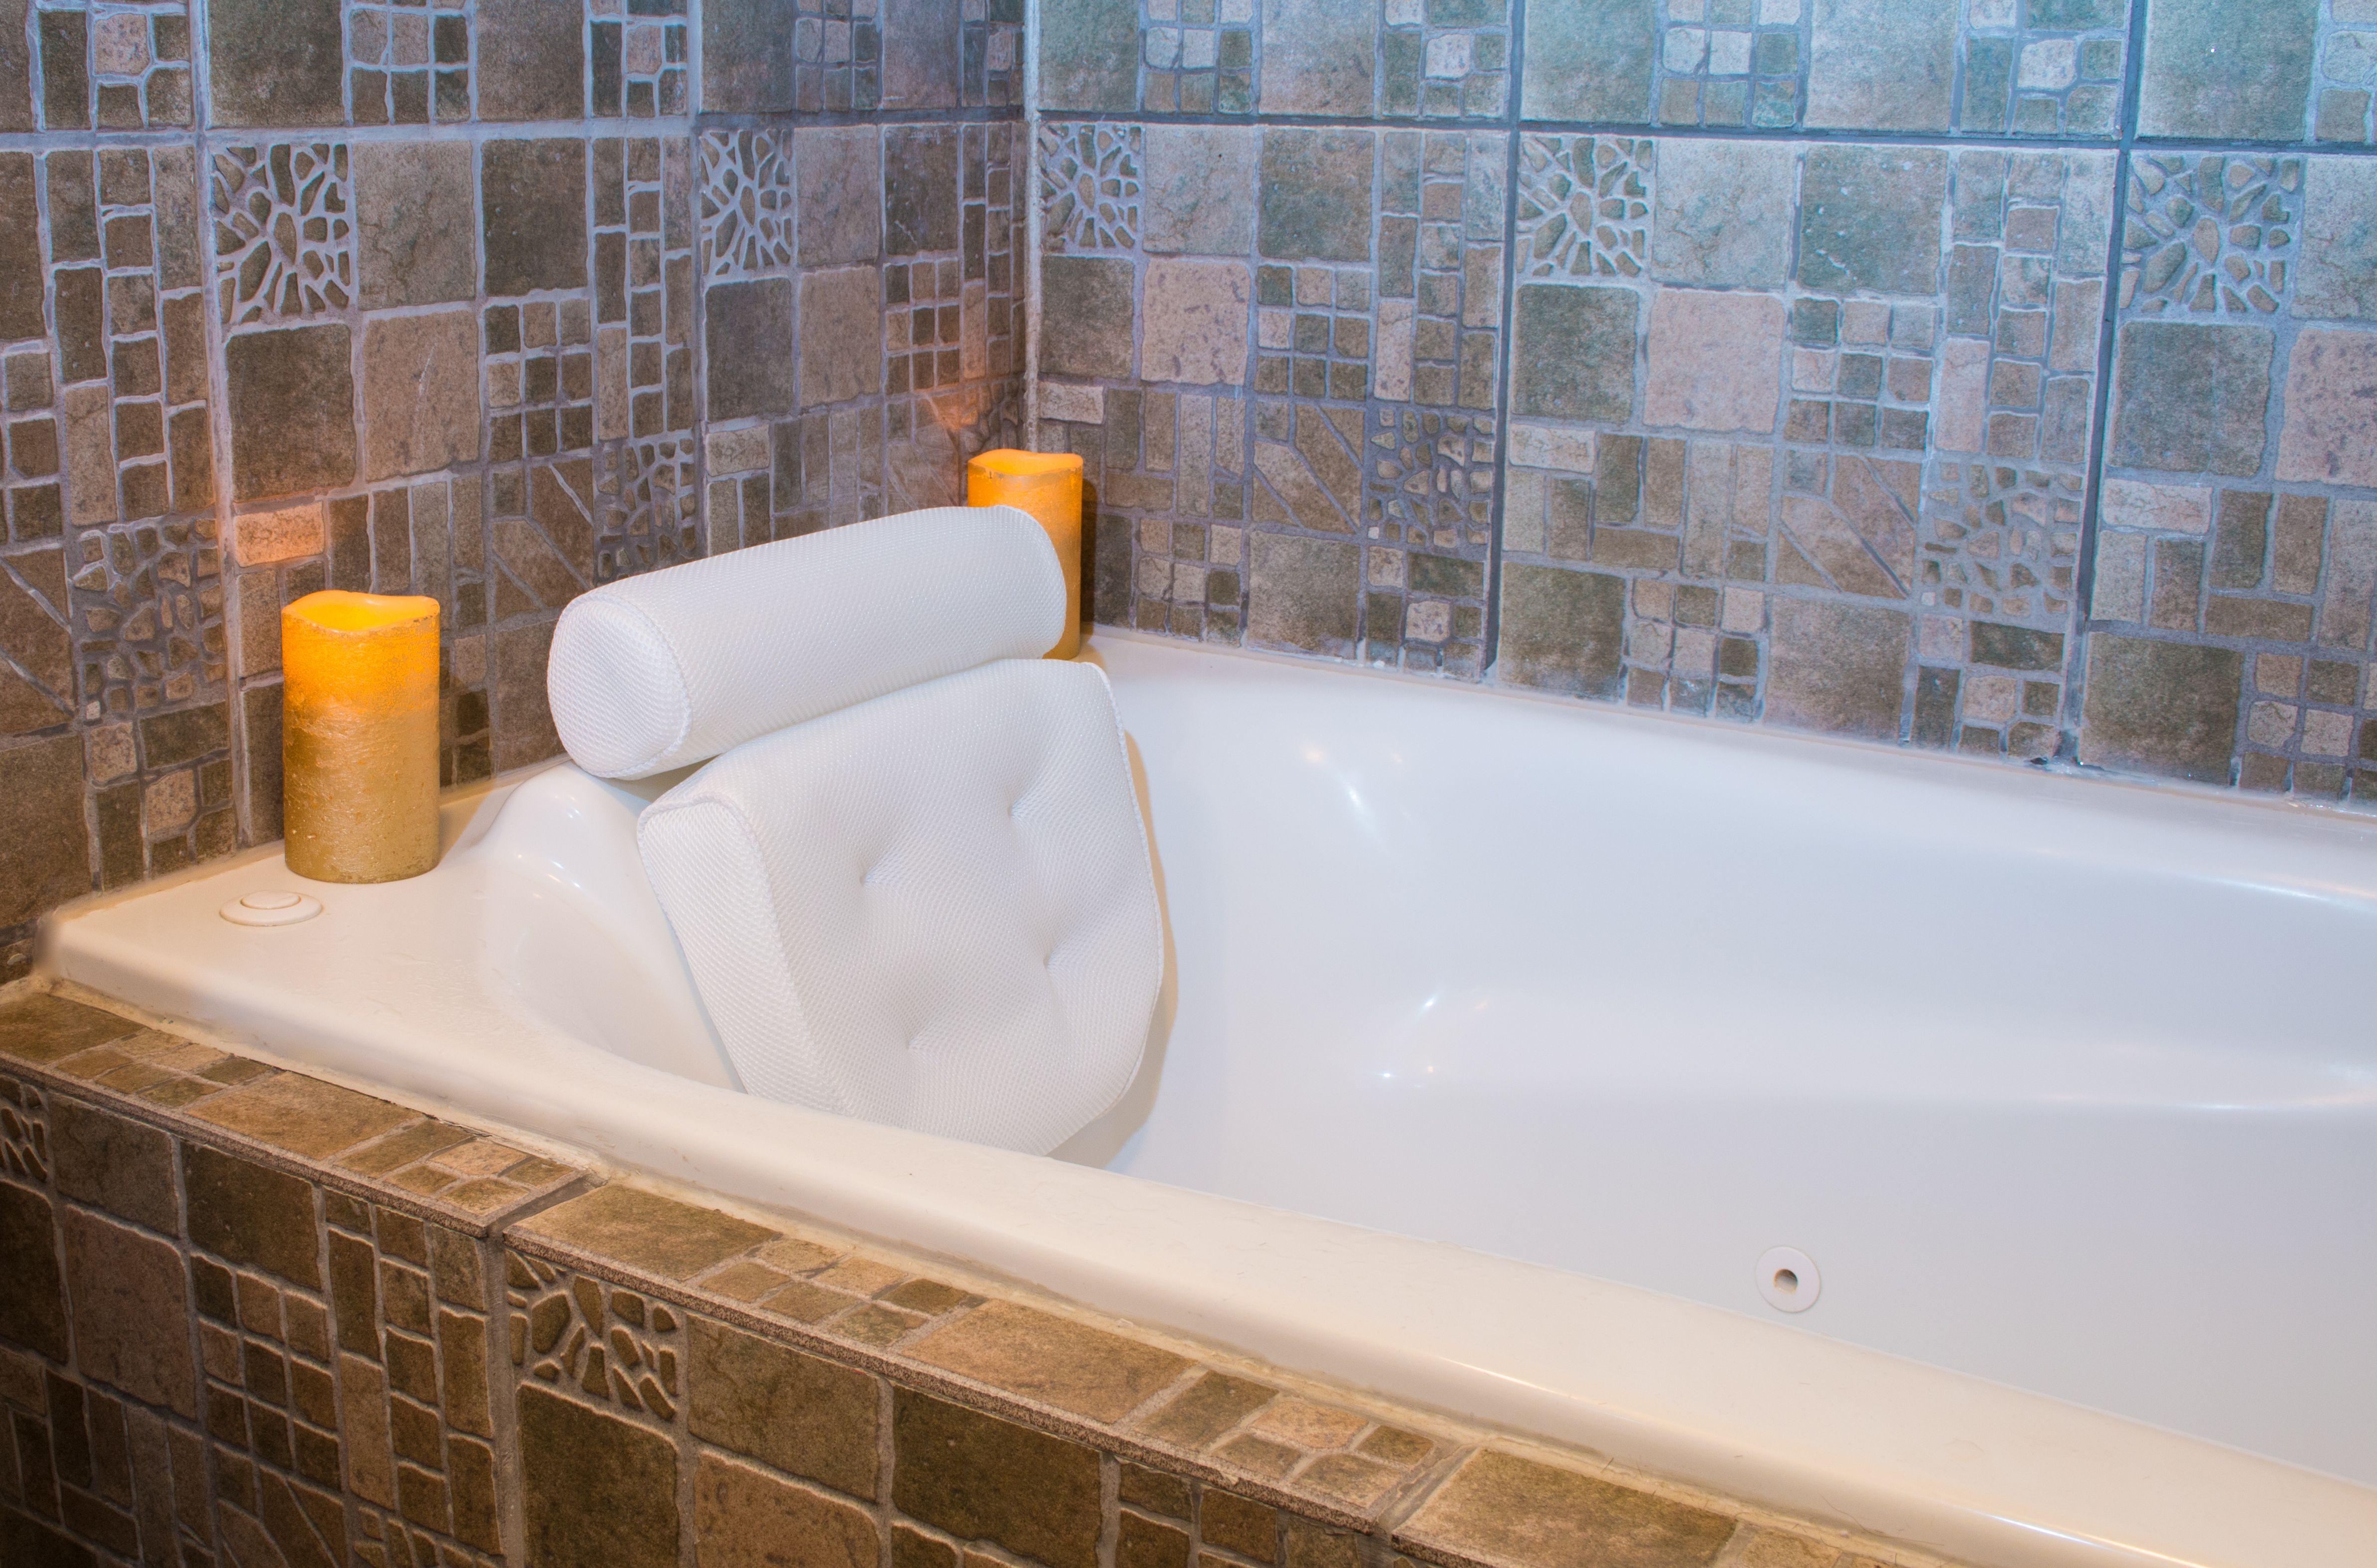 Posh Bath Ultra Comfort Bath Pillow The best bath pillow on the ...